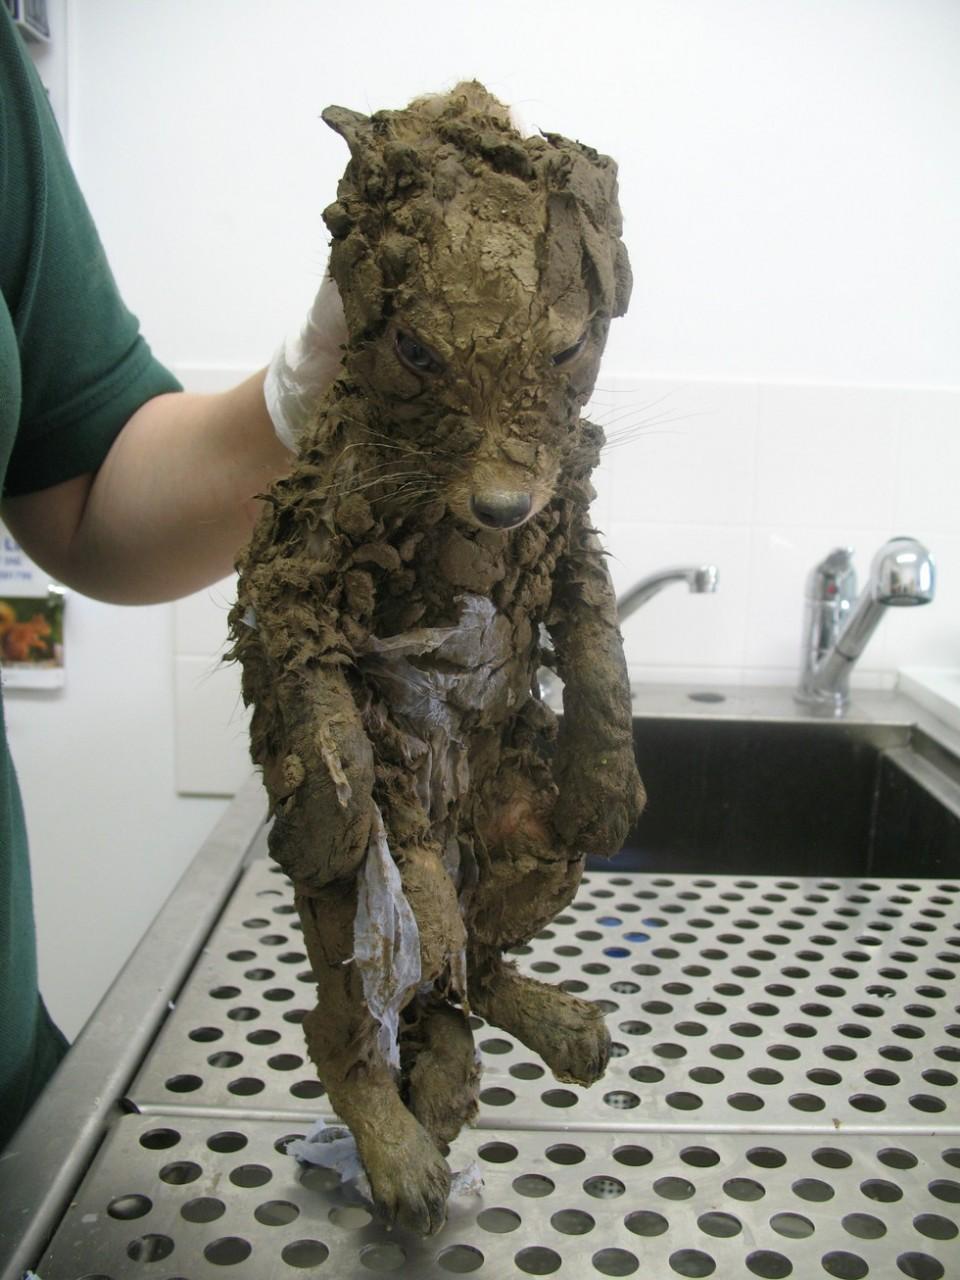 Они отмыли кусок грязи и вот кого обнаружили внутри!